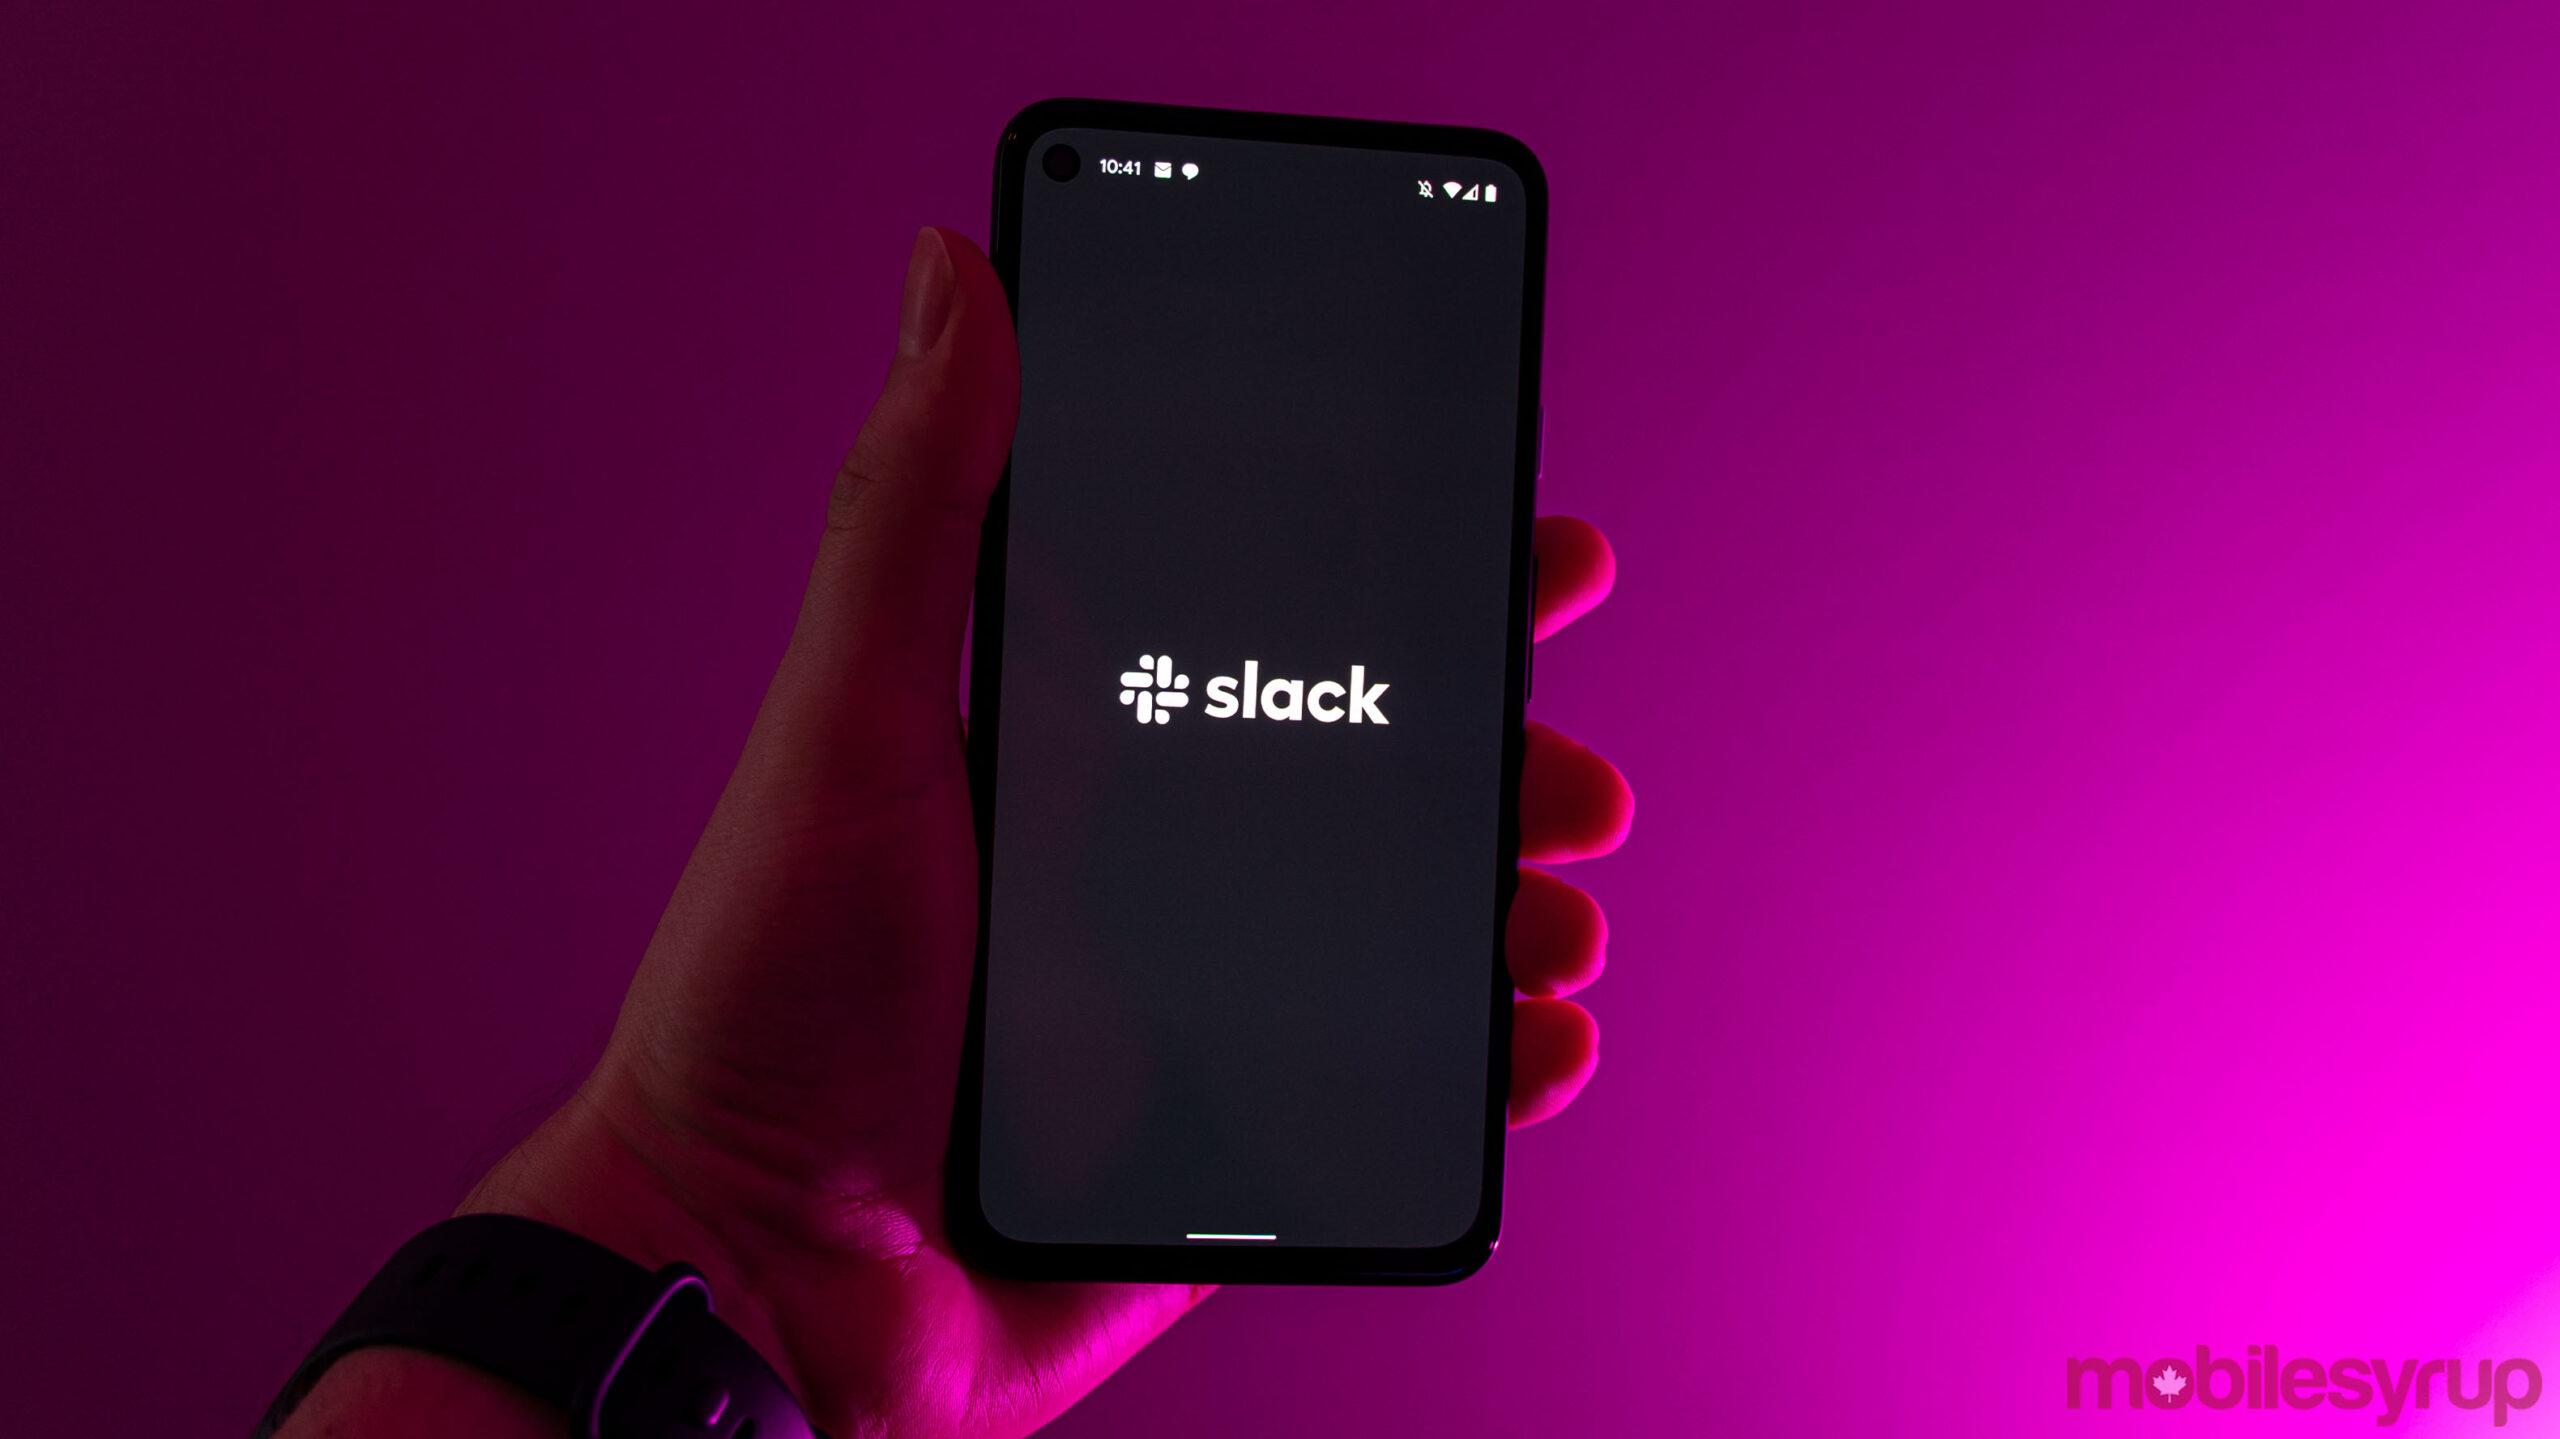 Slack logo on Android